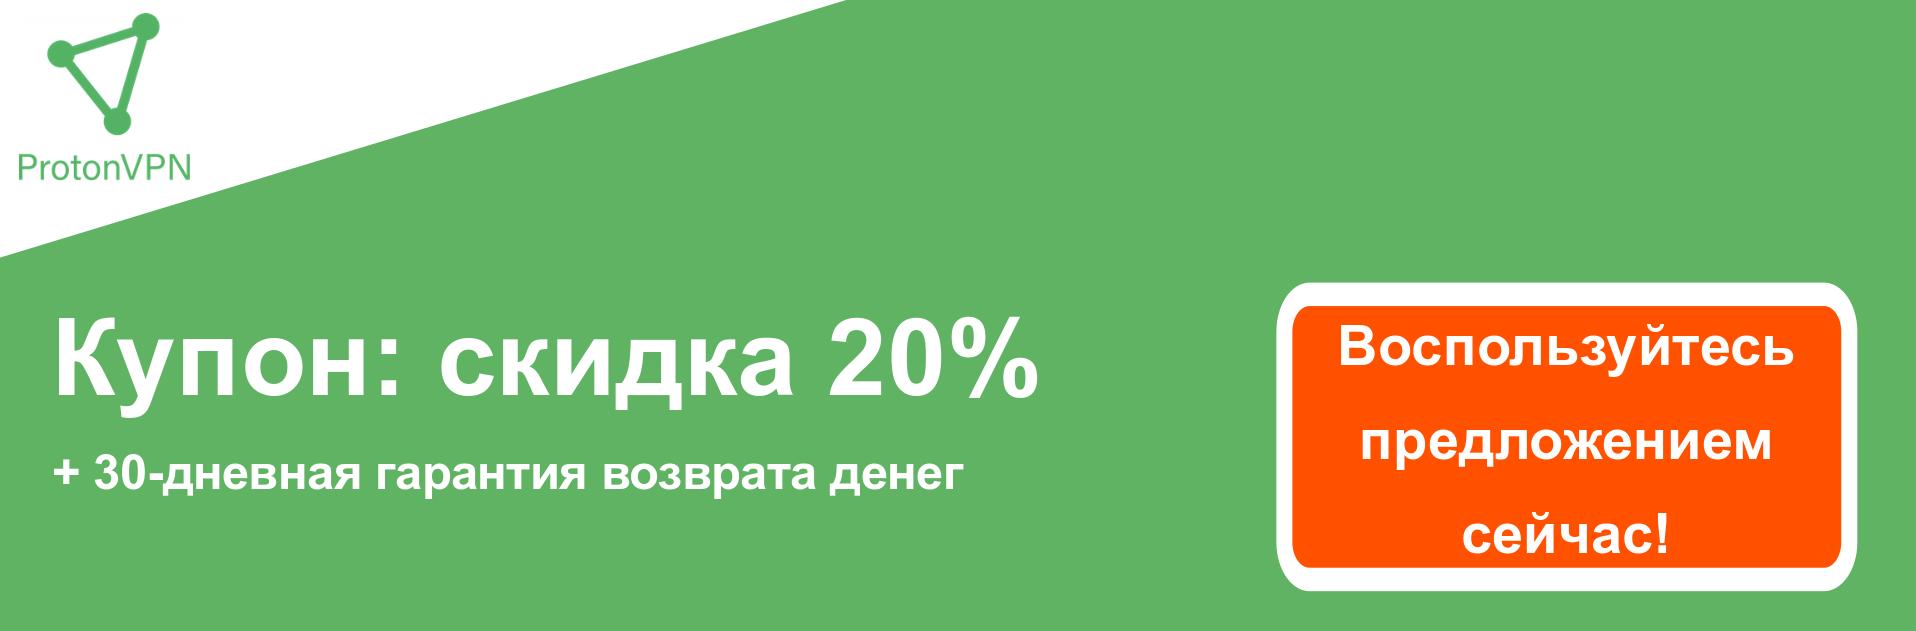 Купон-баннер ProtonVPN - скидка 20%